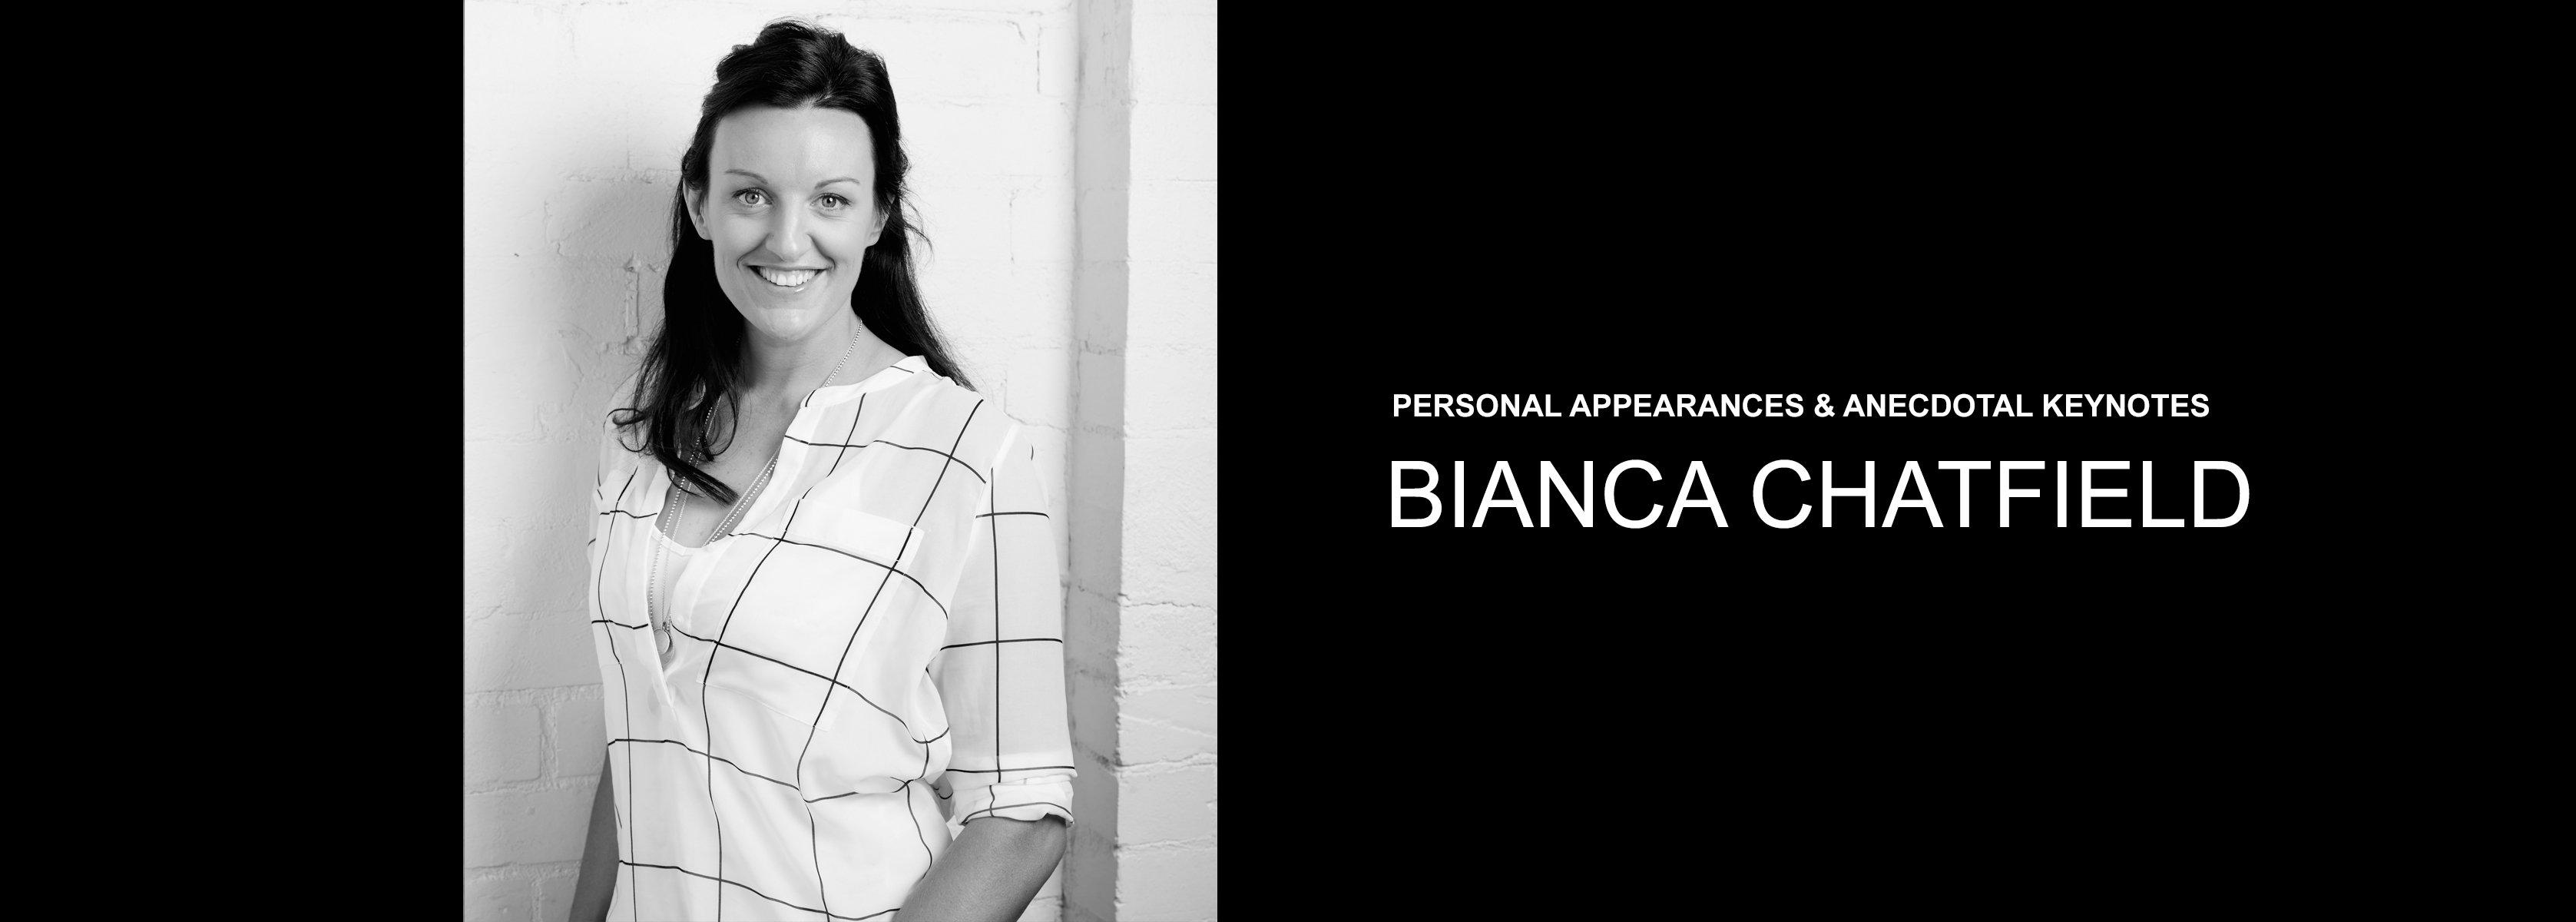 Bianca Chatfield - Elite Athlete, Sport Broadcaster - Bravo Talent Management